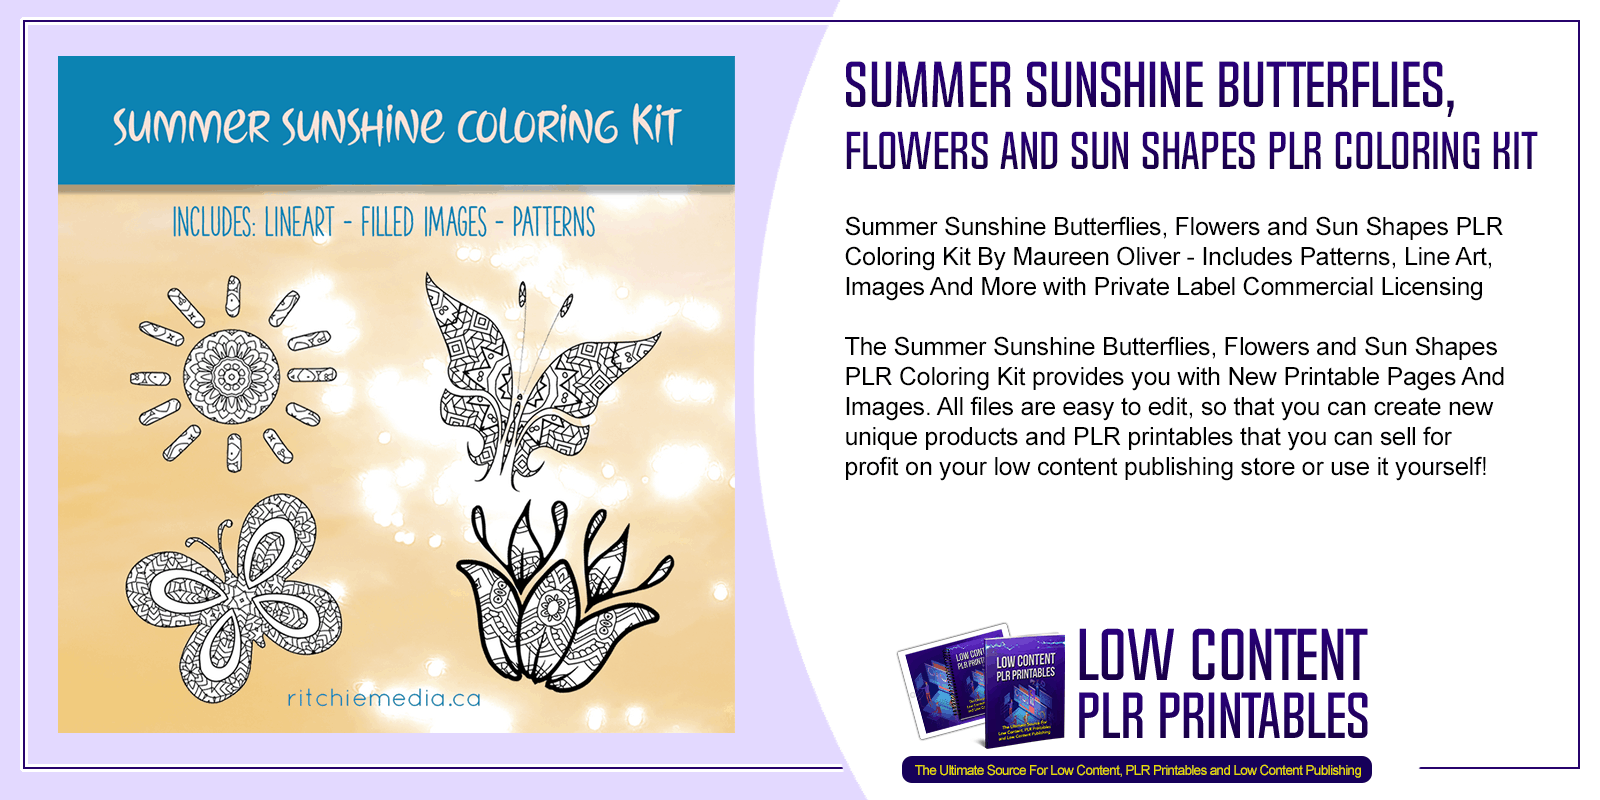 Summer Sunshine Butterflies Flowers and Sun Shapes PLR Coloring Kit